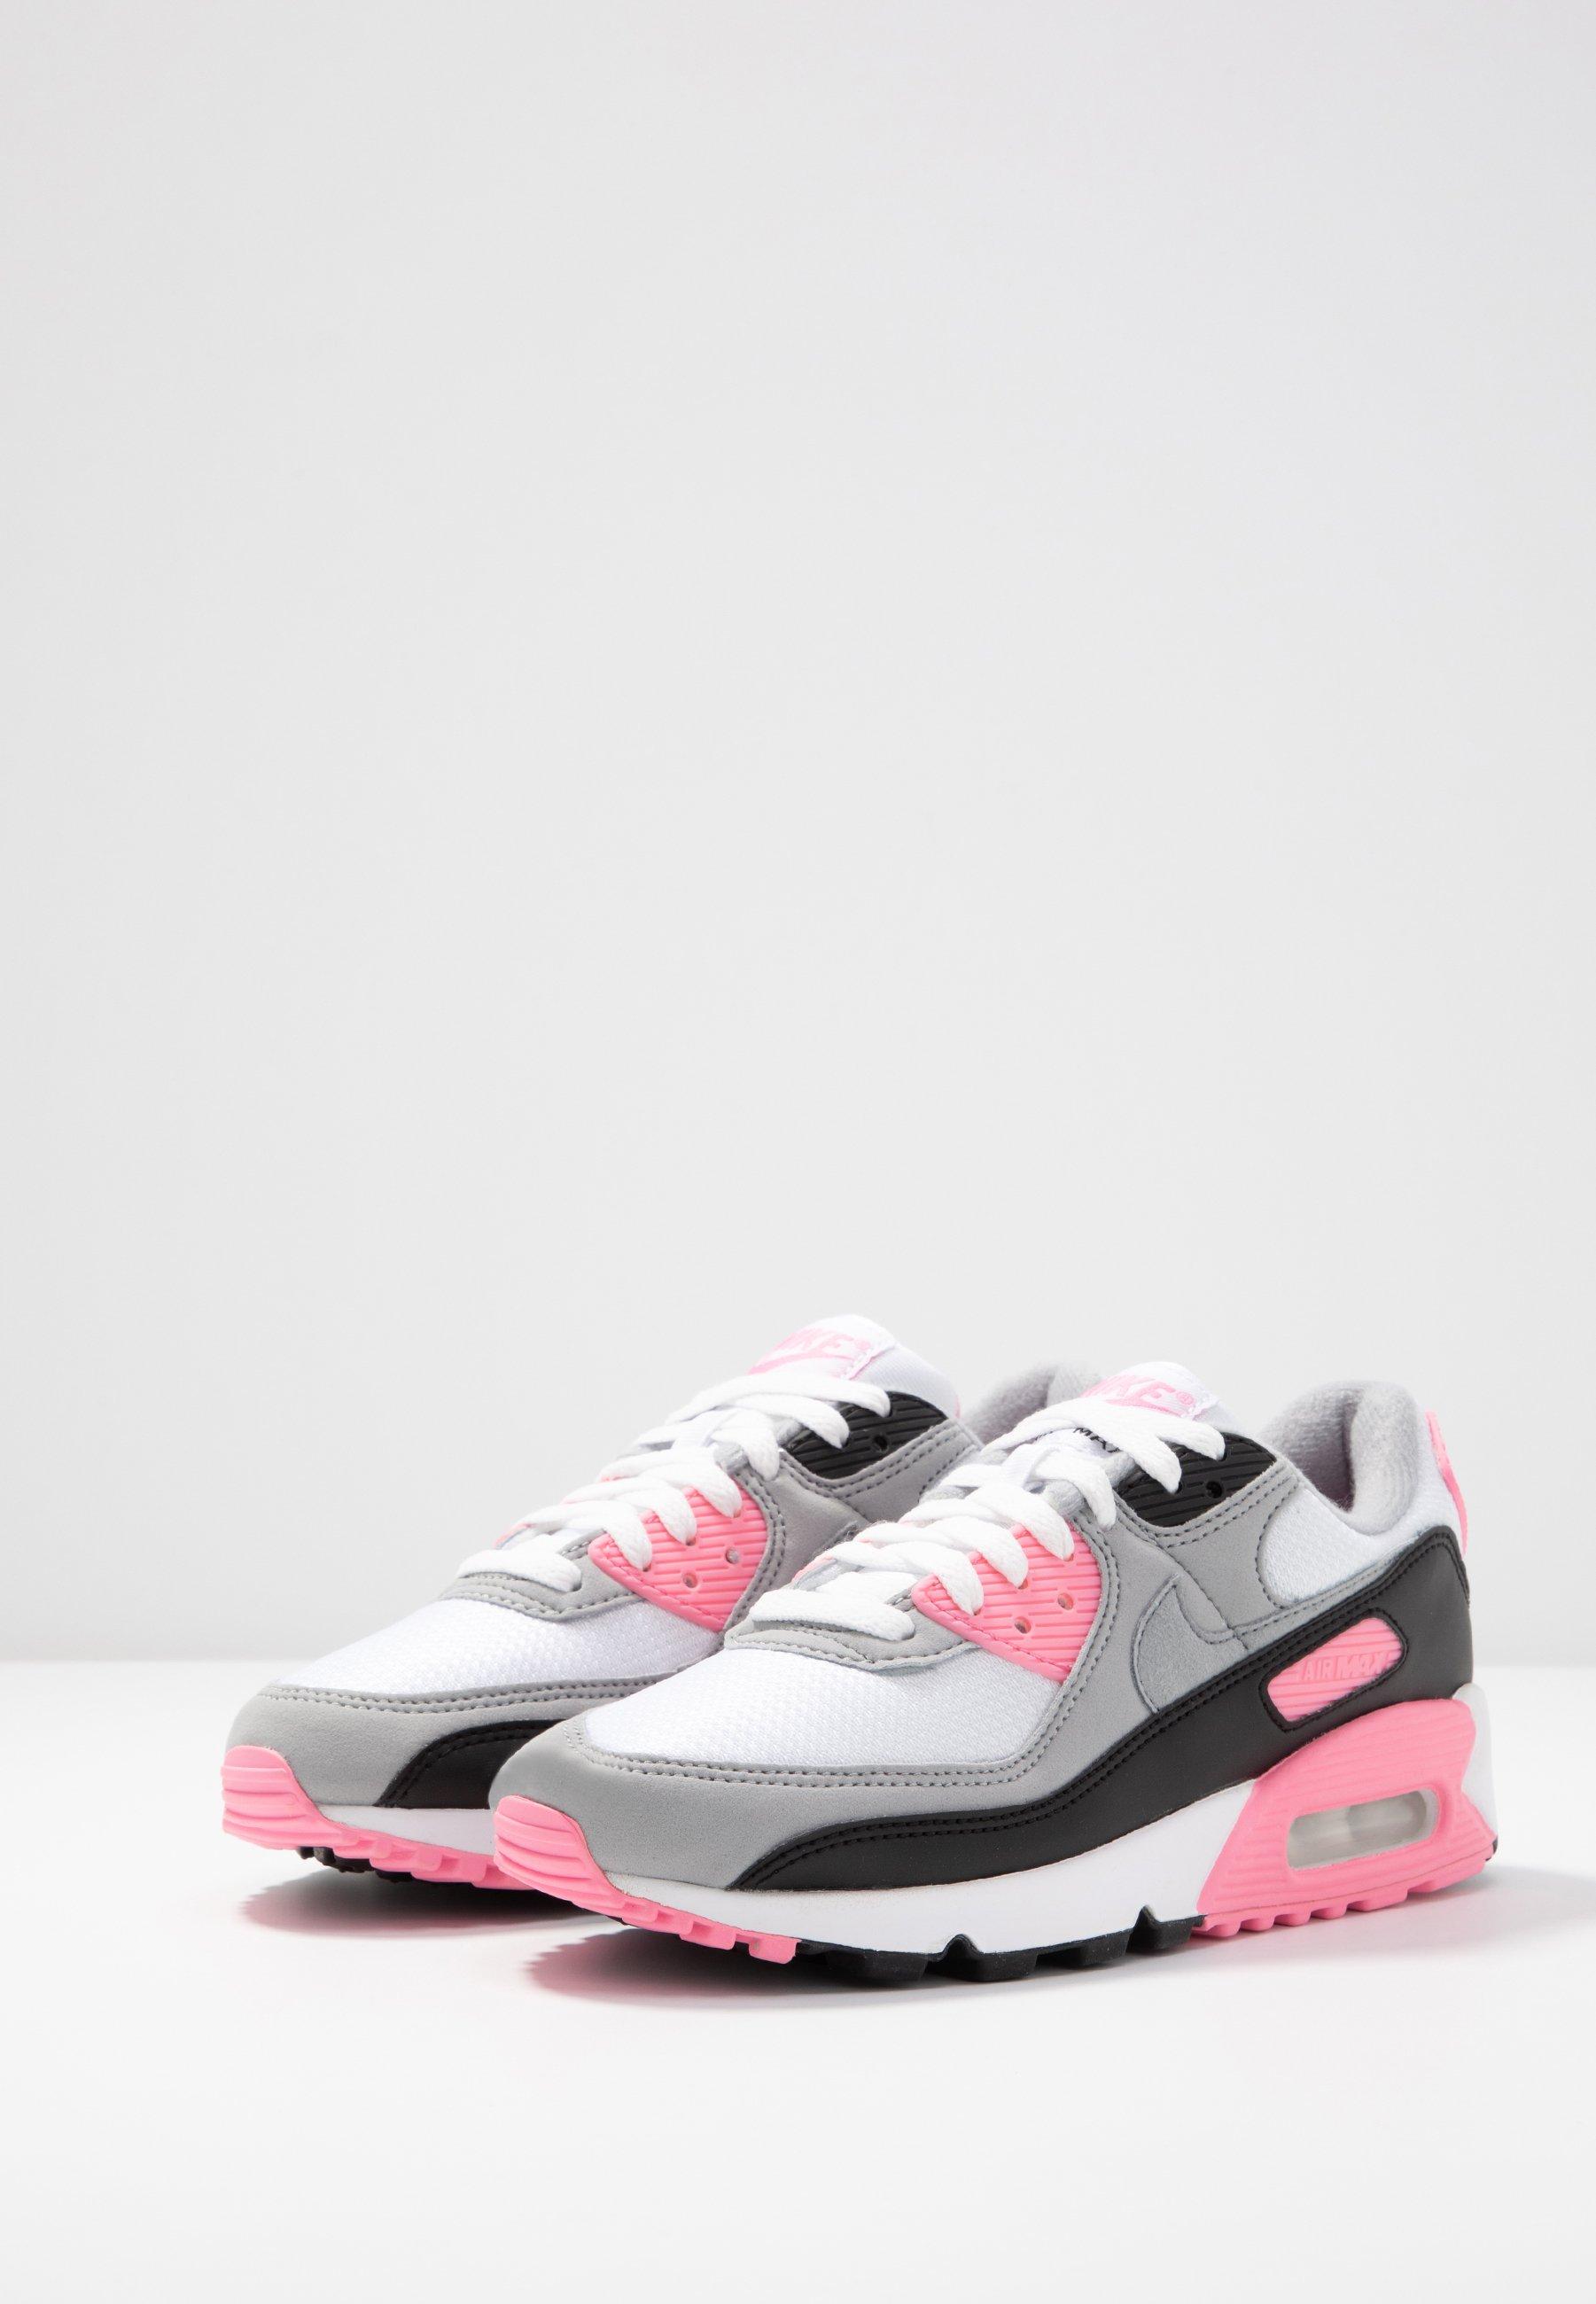 Nike Sportswear Air Max 90 - Sneakers White/particle Grey/rose/black/light Smoke Grey